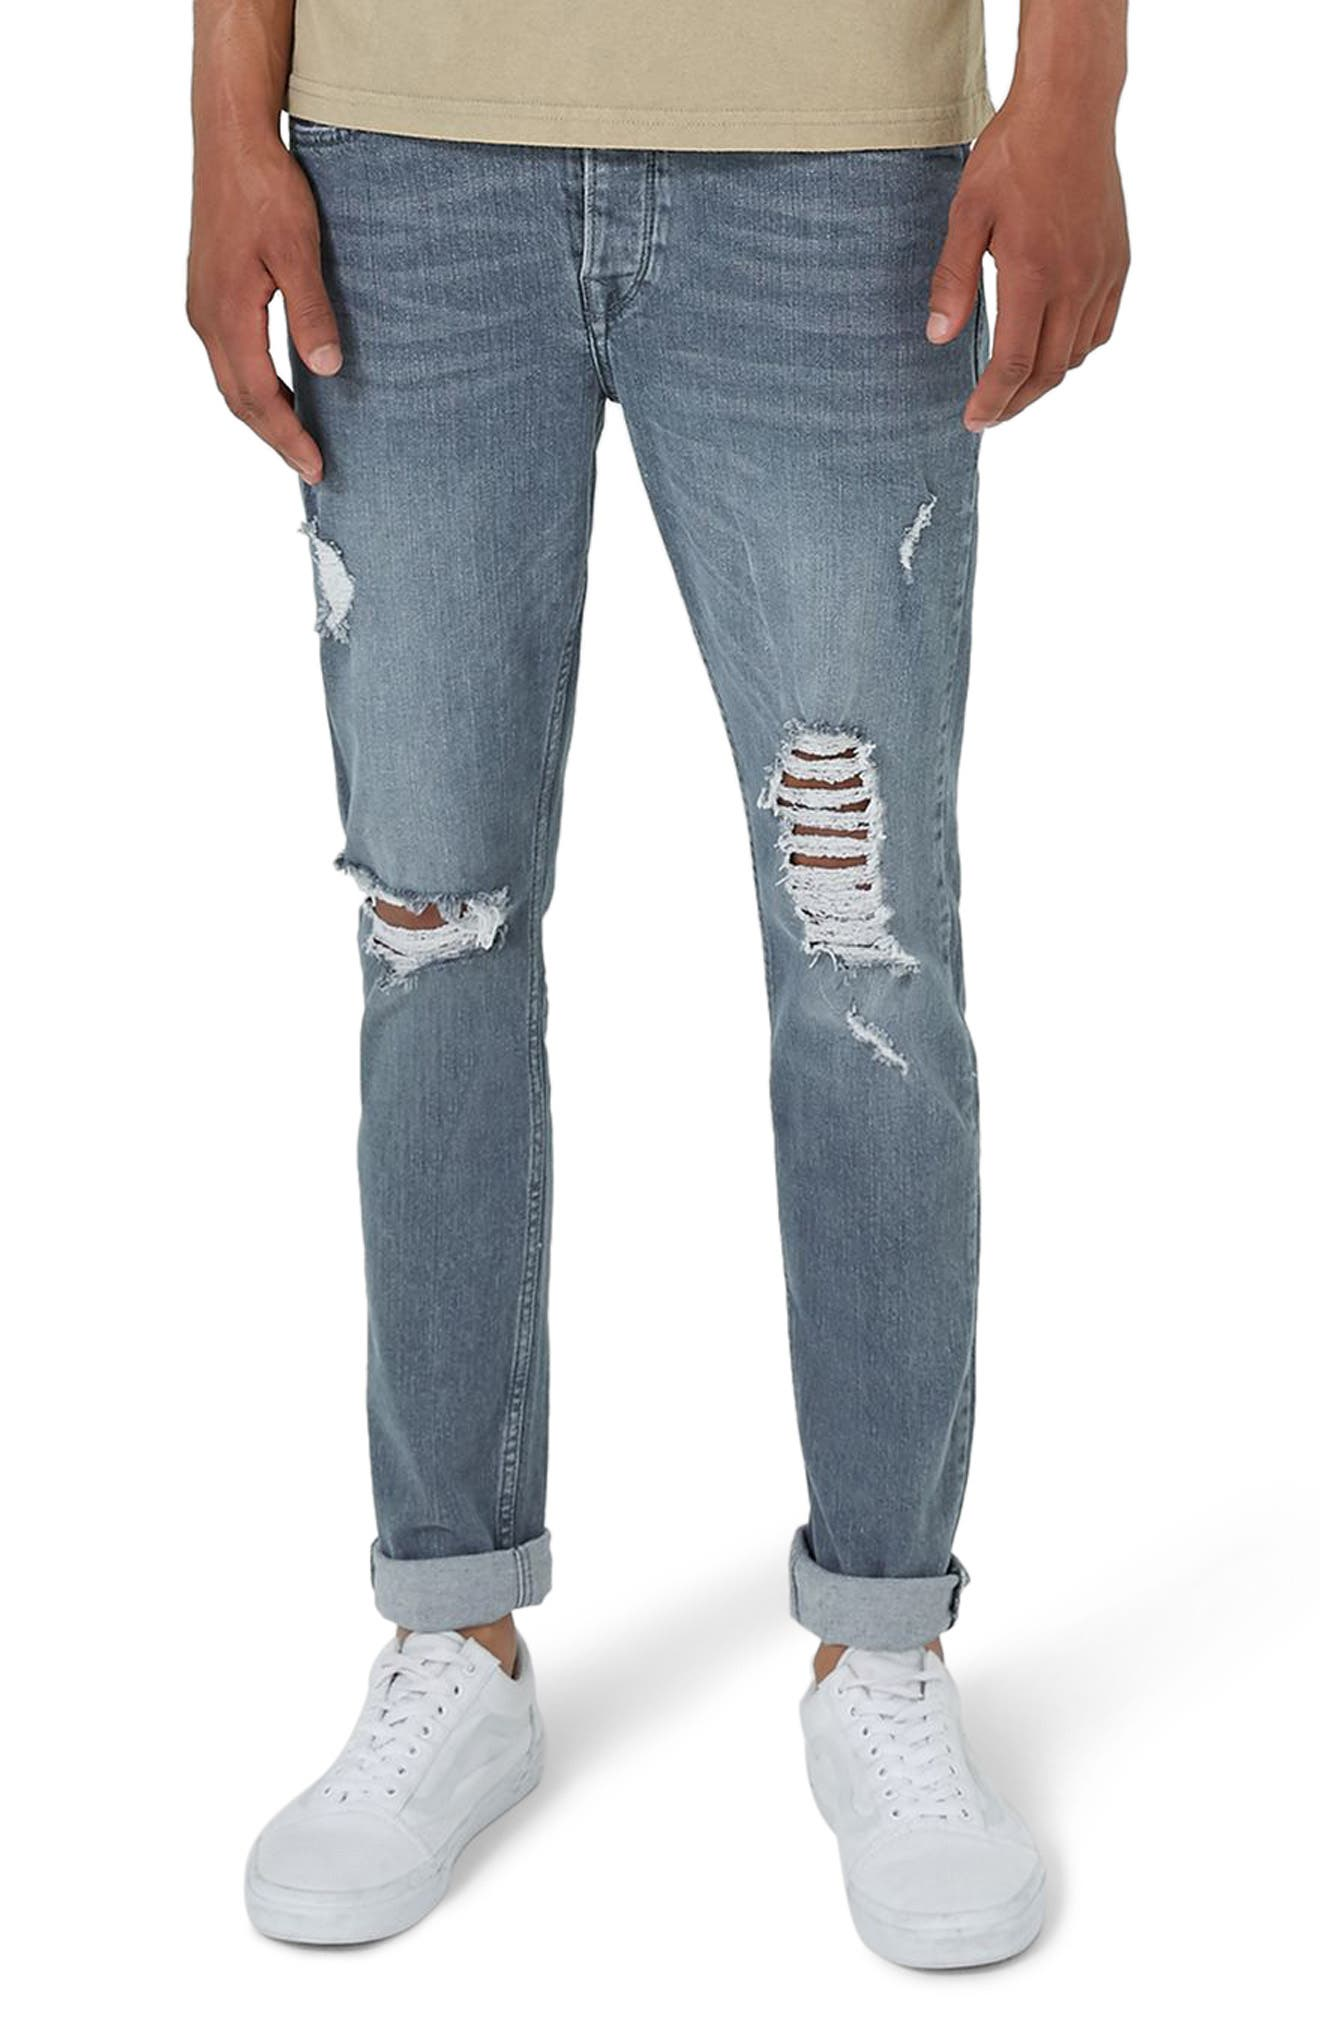 Topman Extreme Rip Stretch Jeans